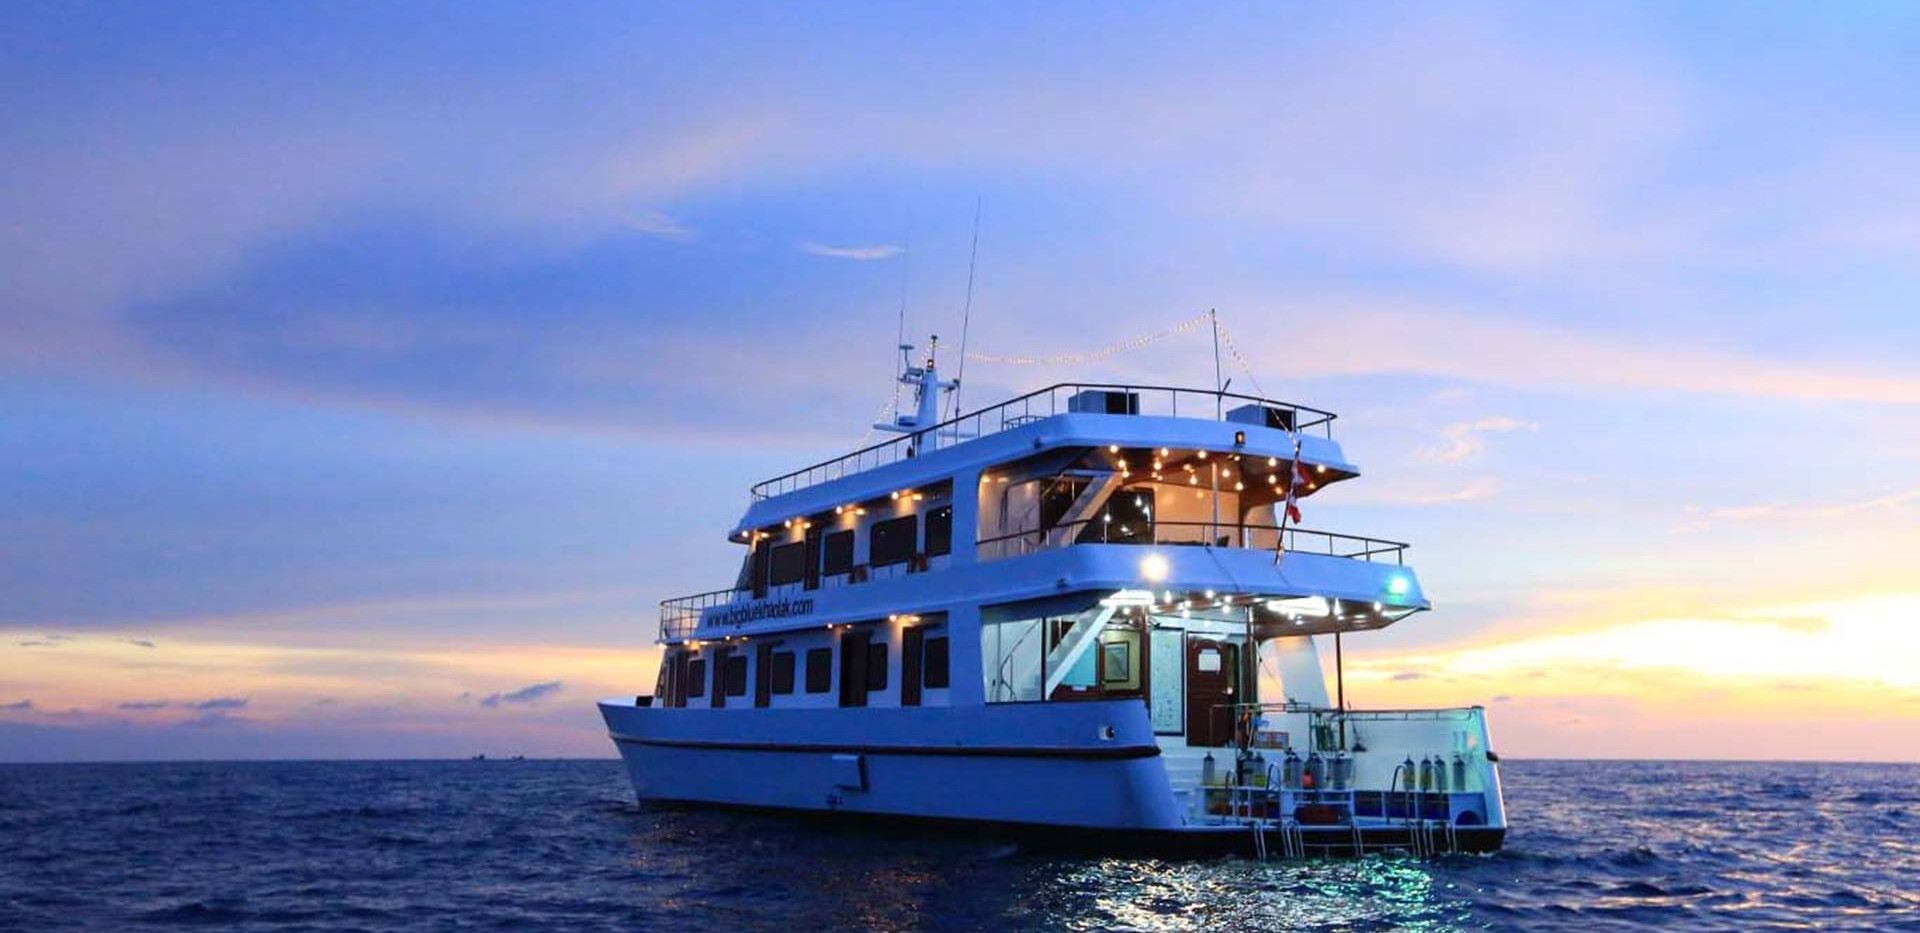 Hallelujah-Sunset-Liveaboard-Similan-Islands-Phuket-Thailand-Best.jpg